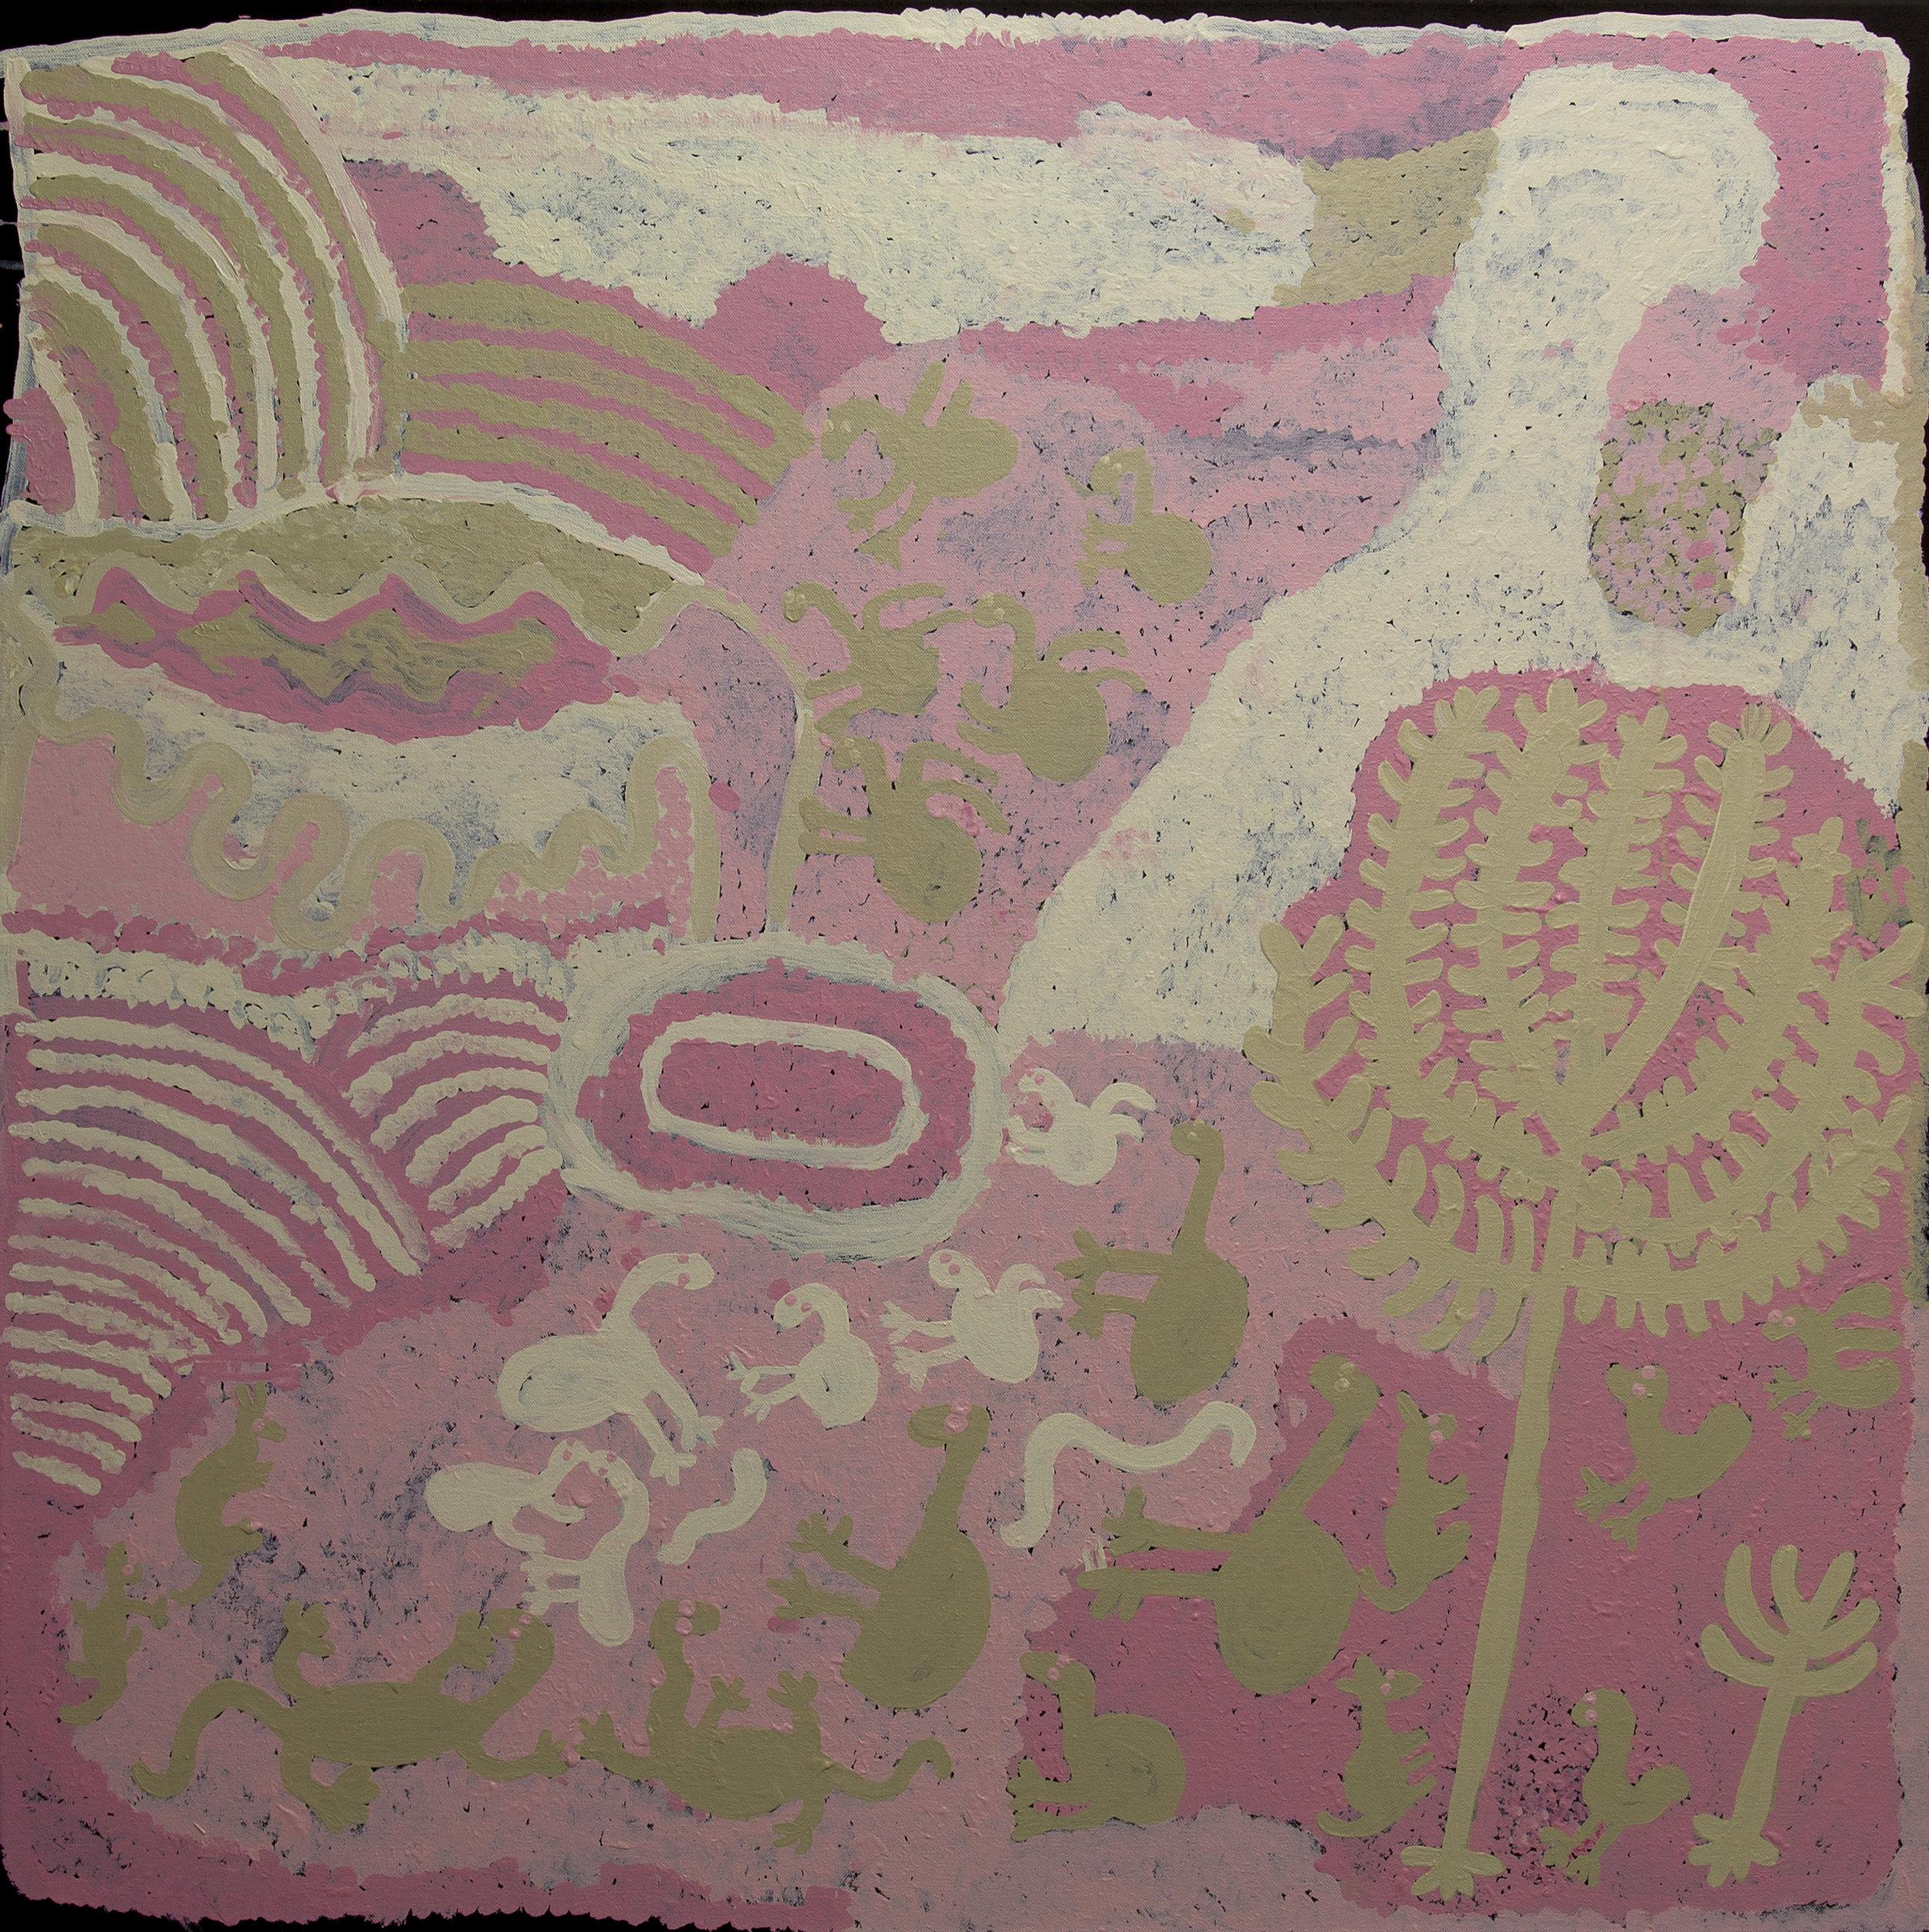 Malara, 2014  100 x 100 cm Acrylic on Canvas Ernabella Arts Catalog #216-14   SOLD     SOLD